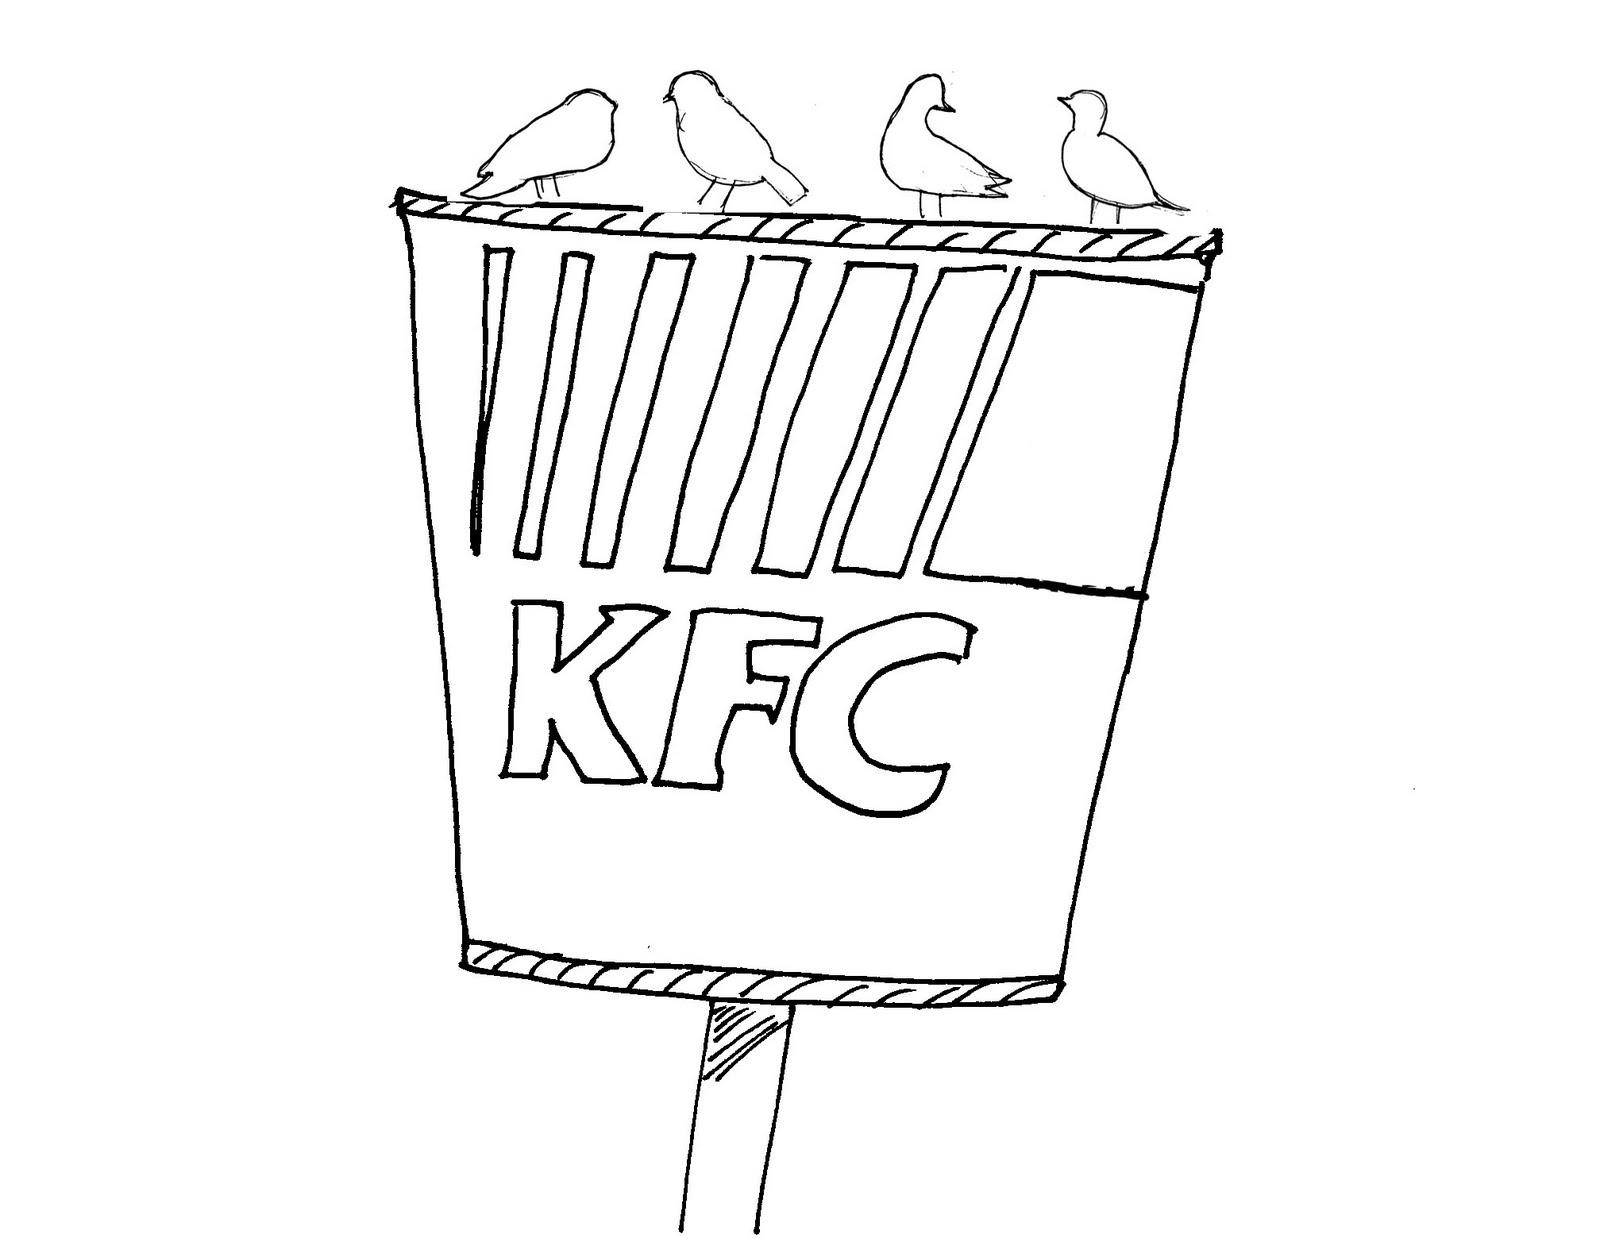 Kane Blog Picz Kfc Chicken Wallpapers